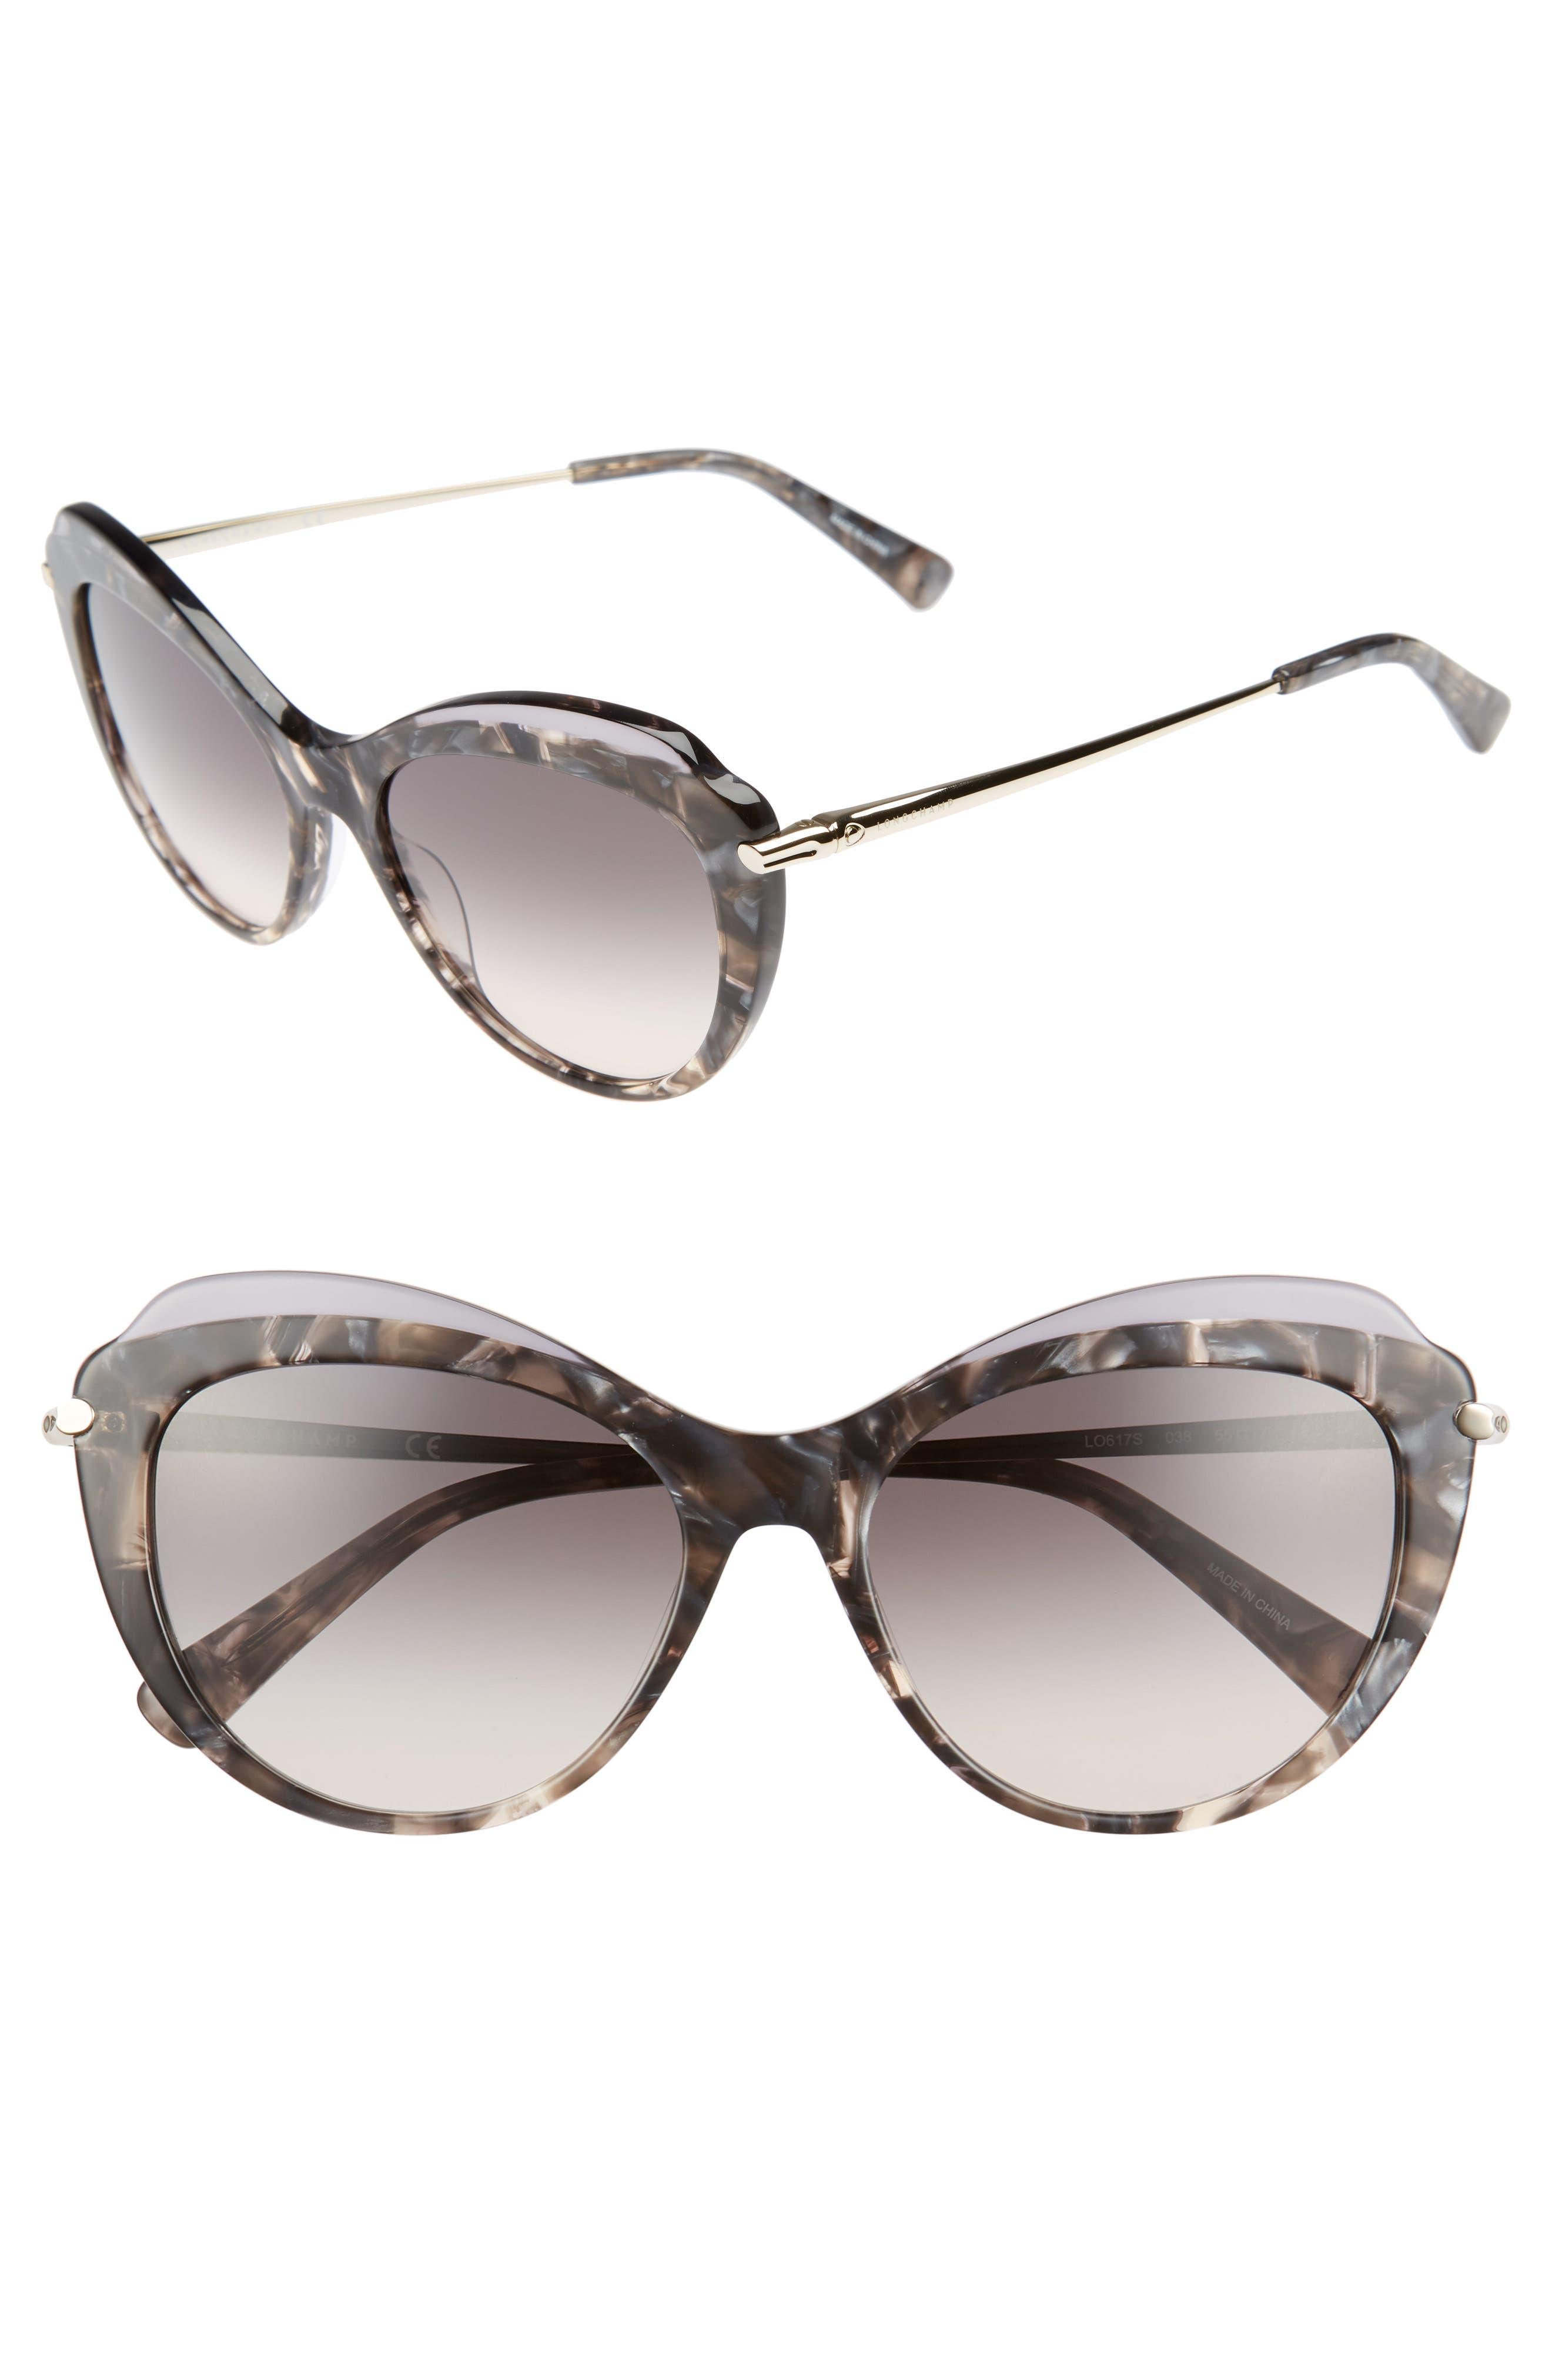 Main Image - Longchamp 55mm Cat Eye Sunglasses